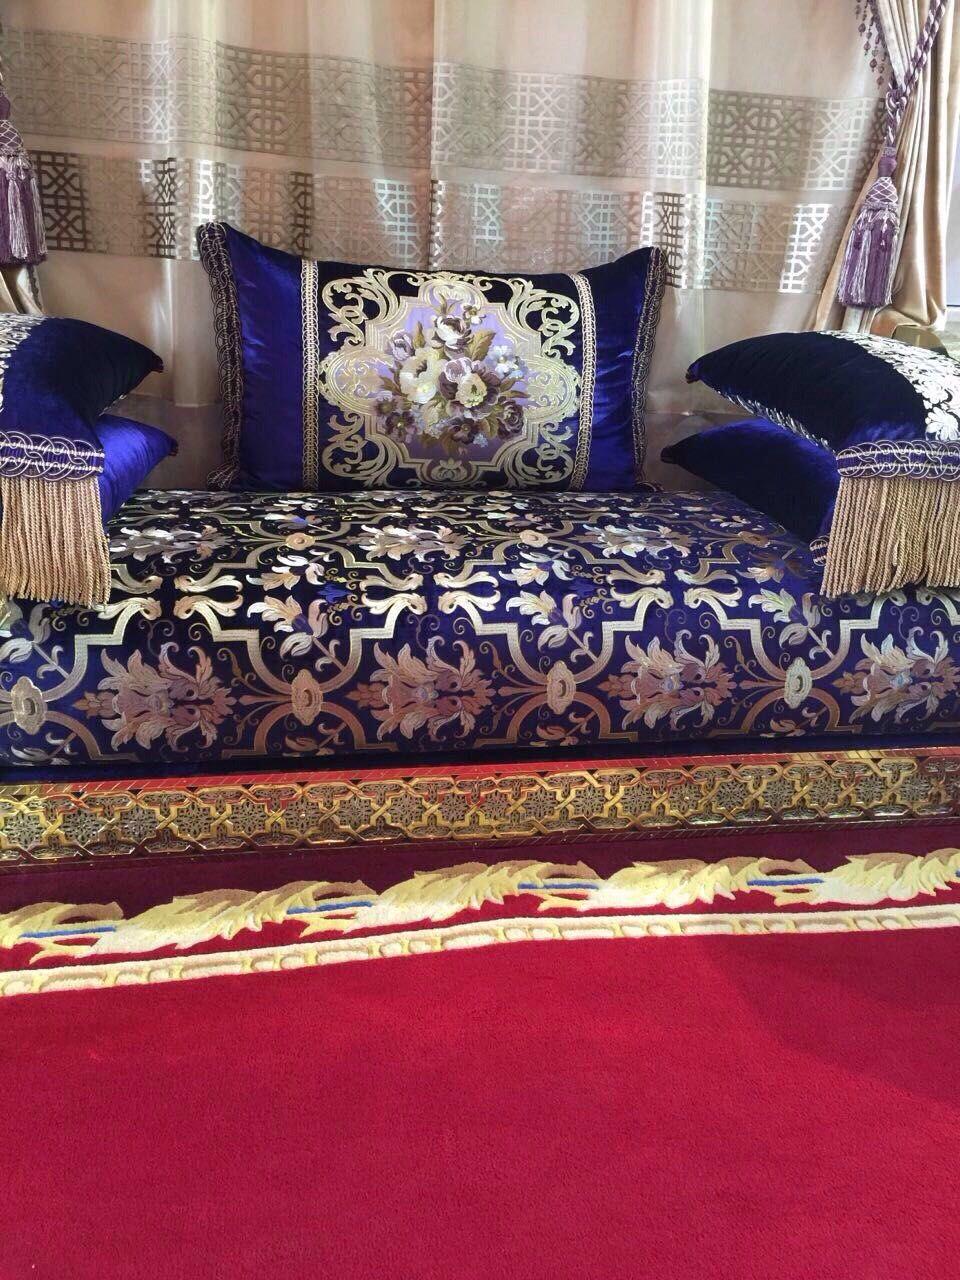 Account Suspended Decor Beautiful Decor Moroccan Living Room